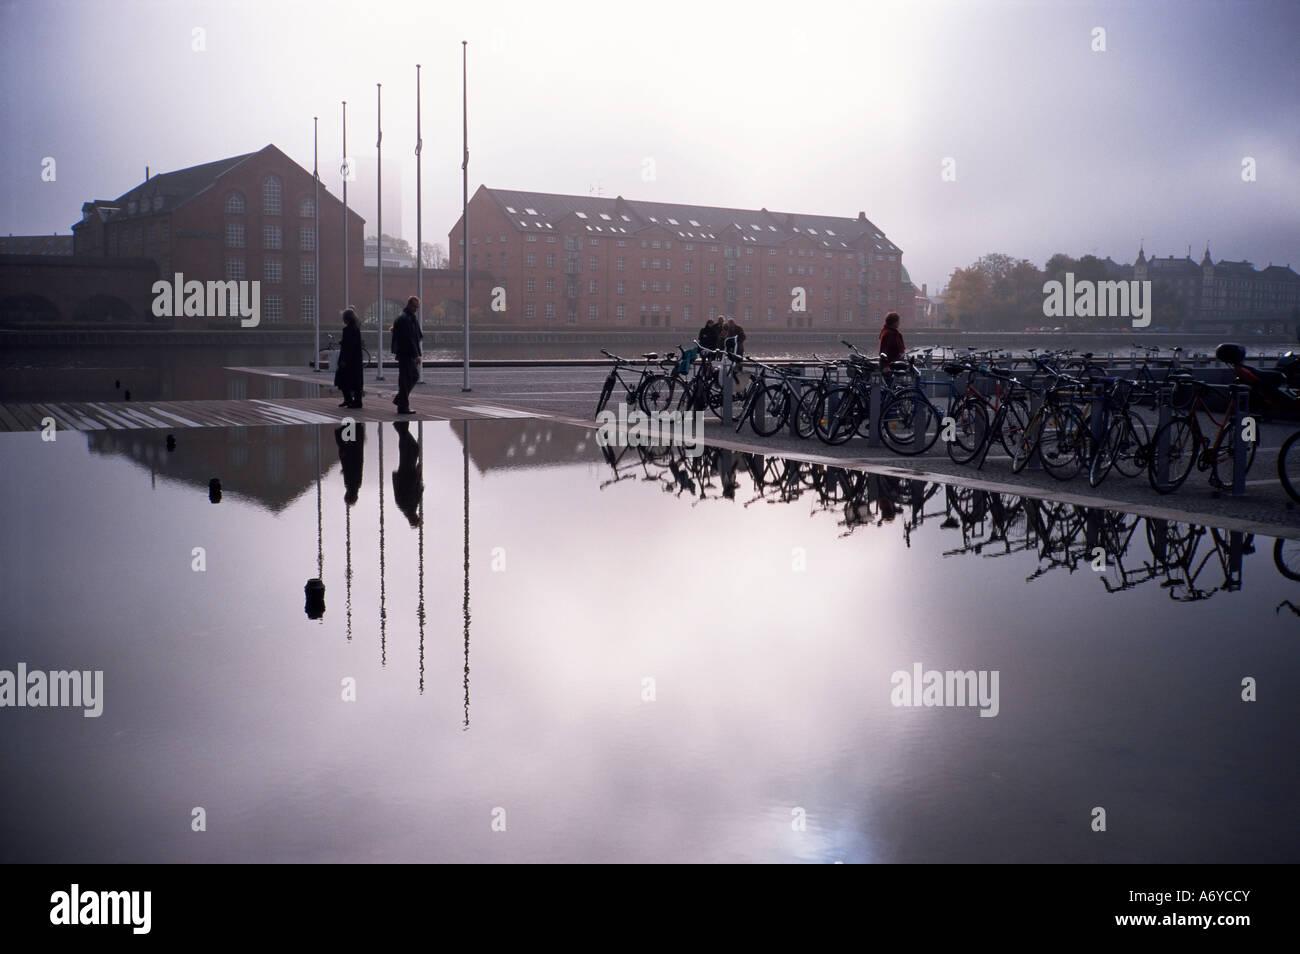 Bicycles reflected in still water Christians Brygge Copenhagen Denmark Scandinavia Europe - Stock Image